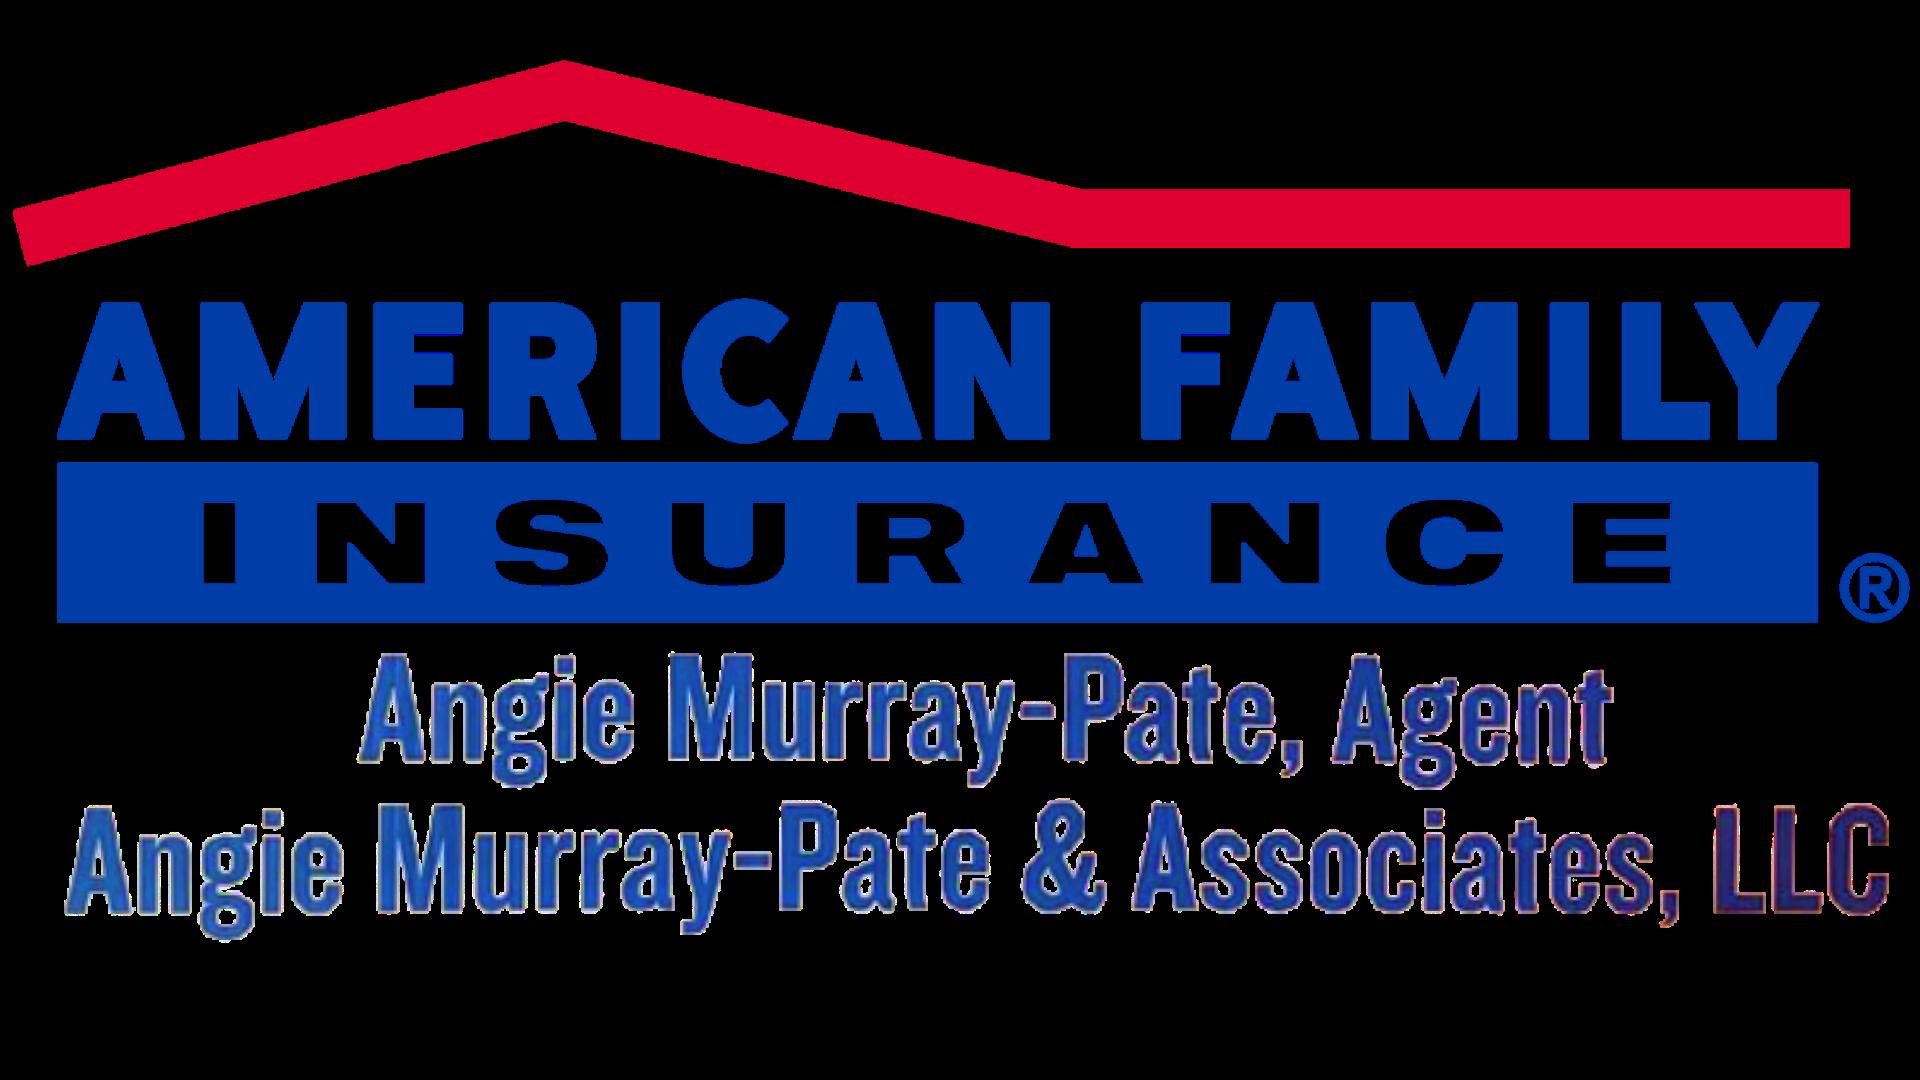 American Family Insurance - Angie Murray-Pate & Assoc., LLC